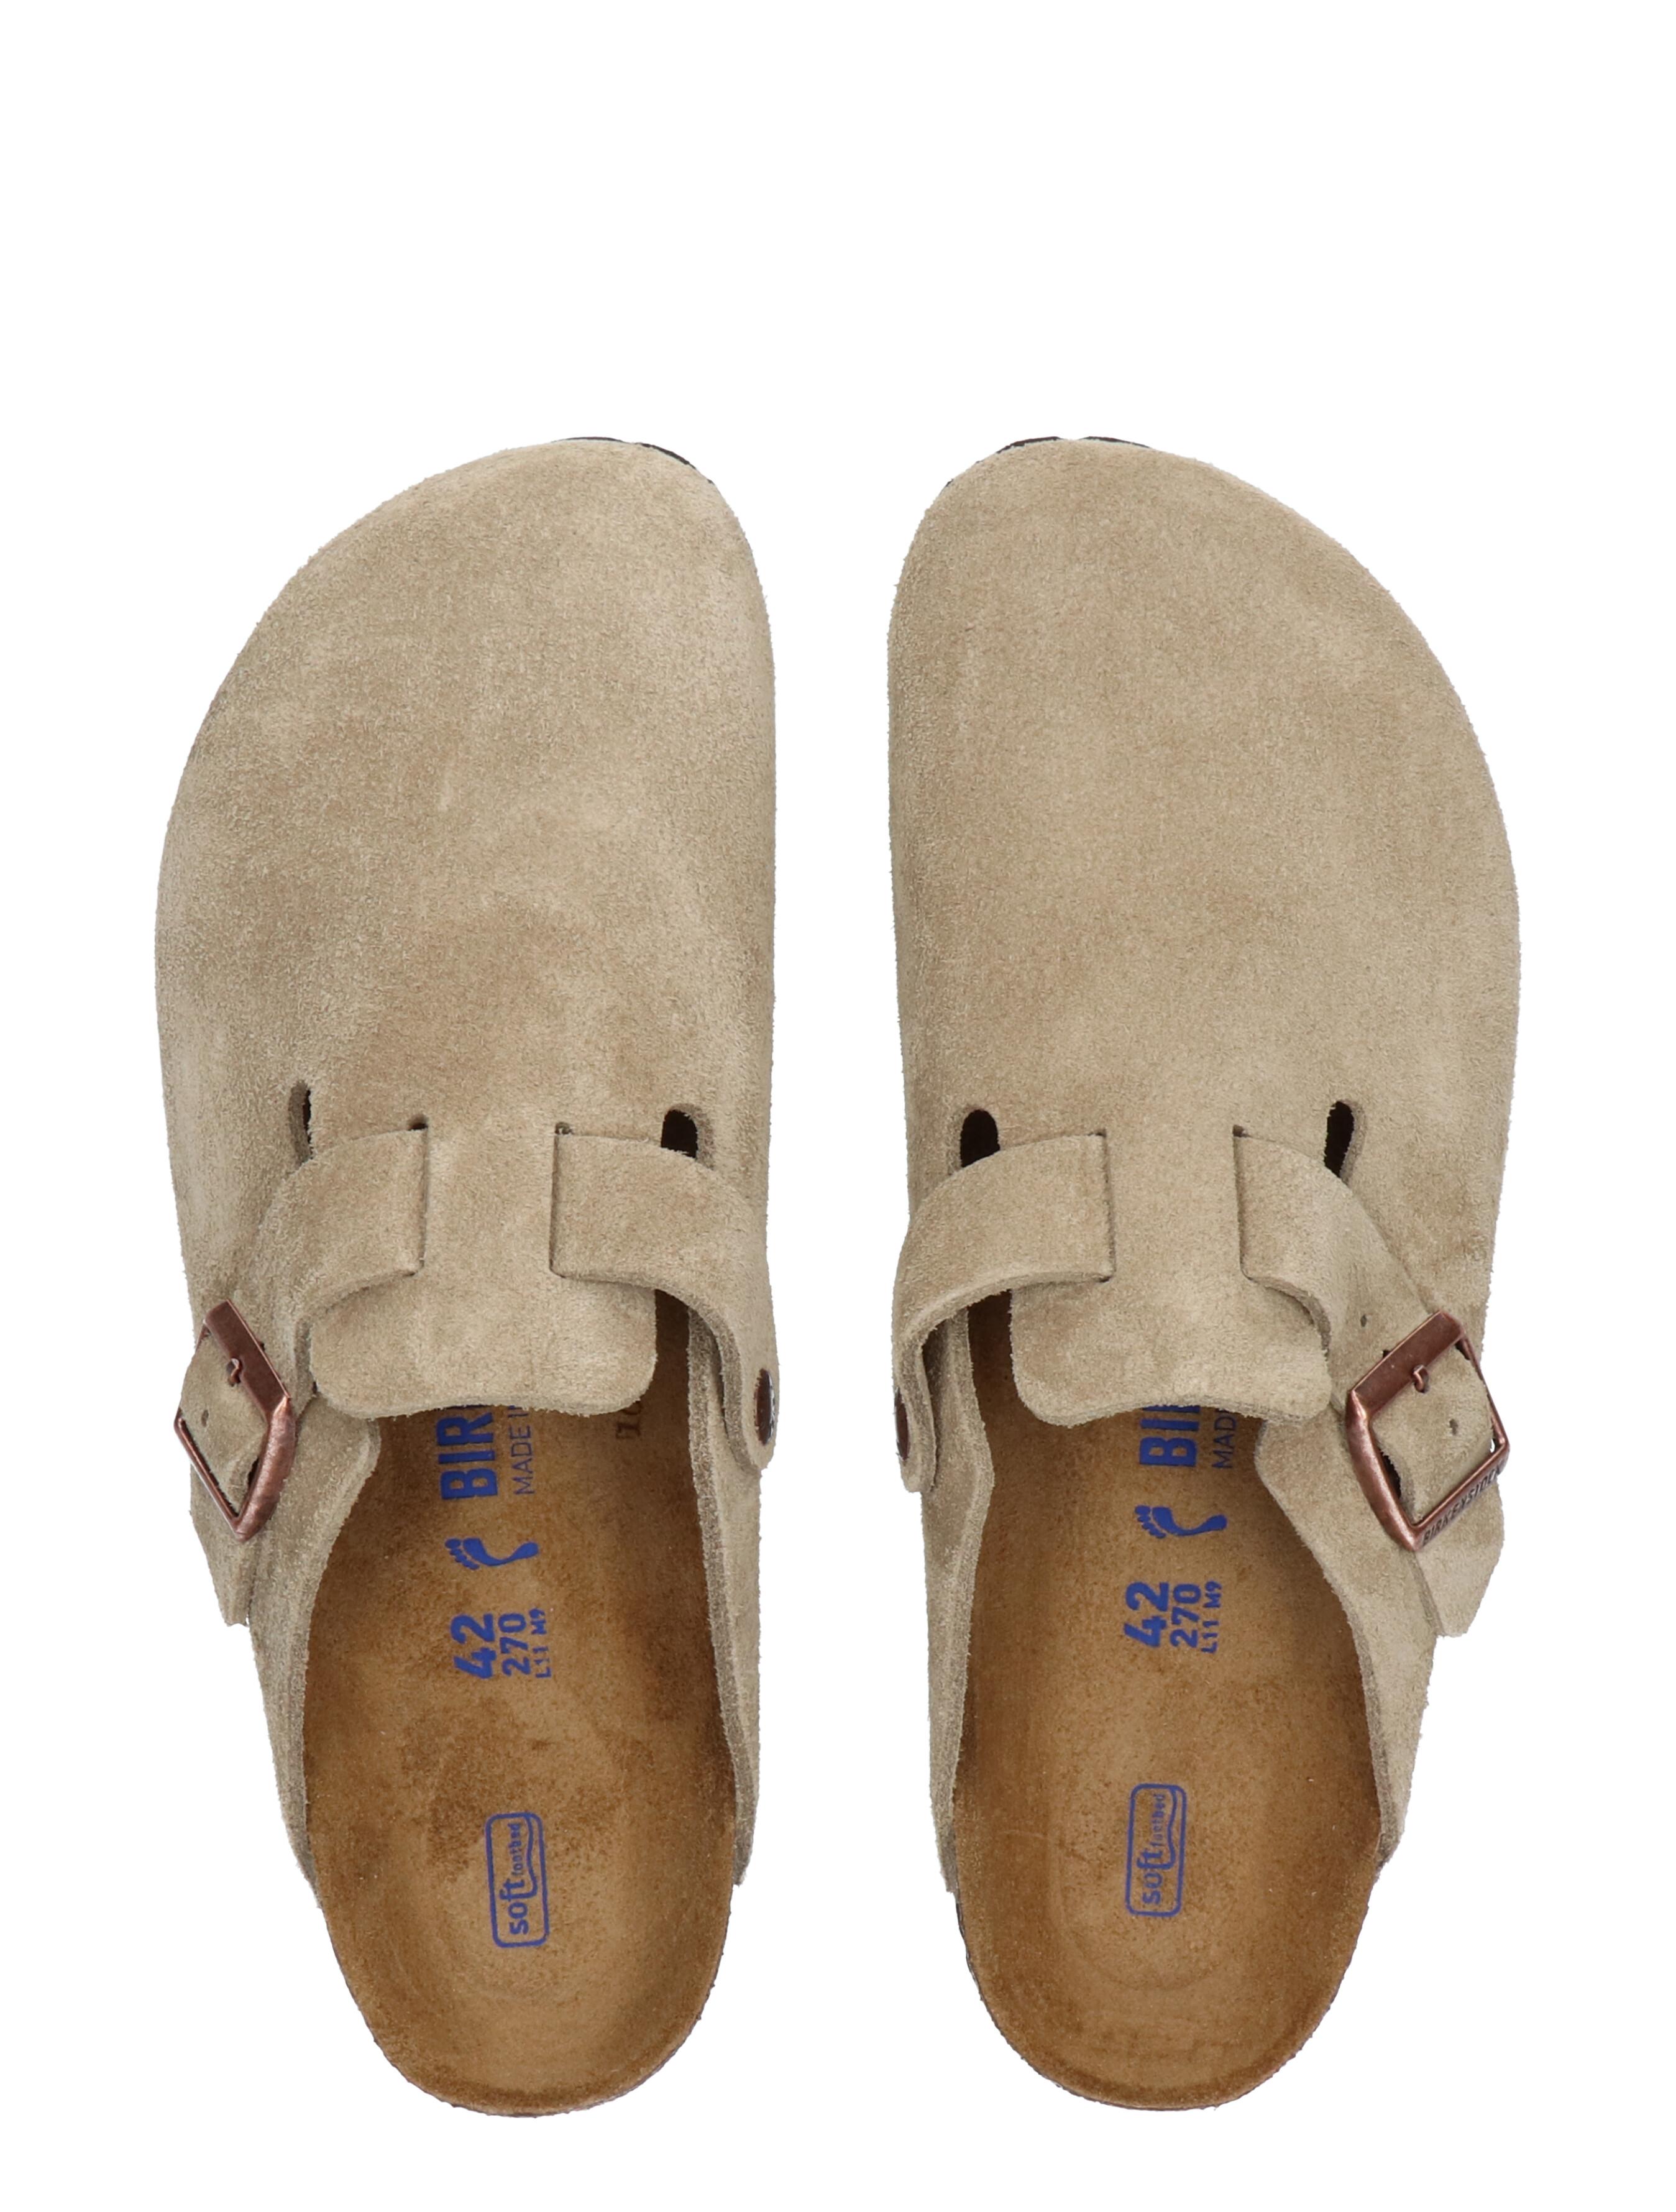 Birkenstock Boston Taupe Smal Slippers